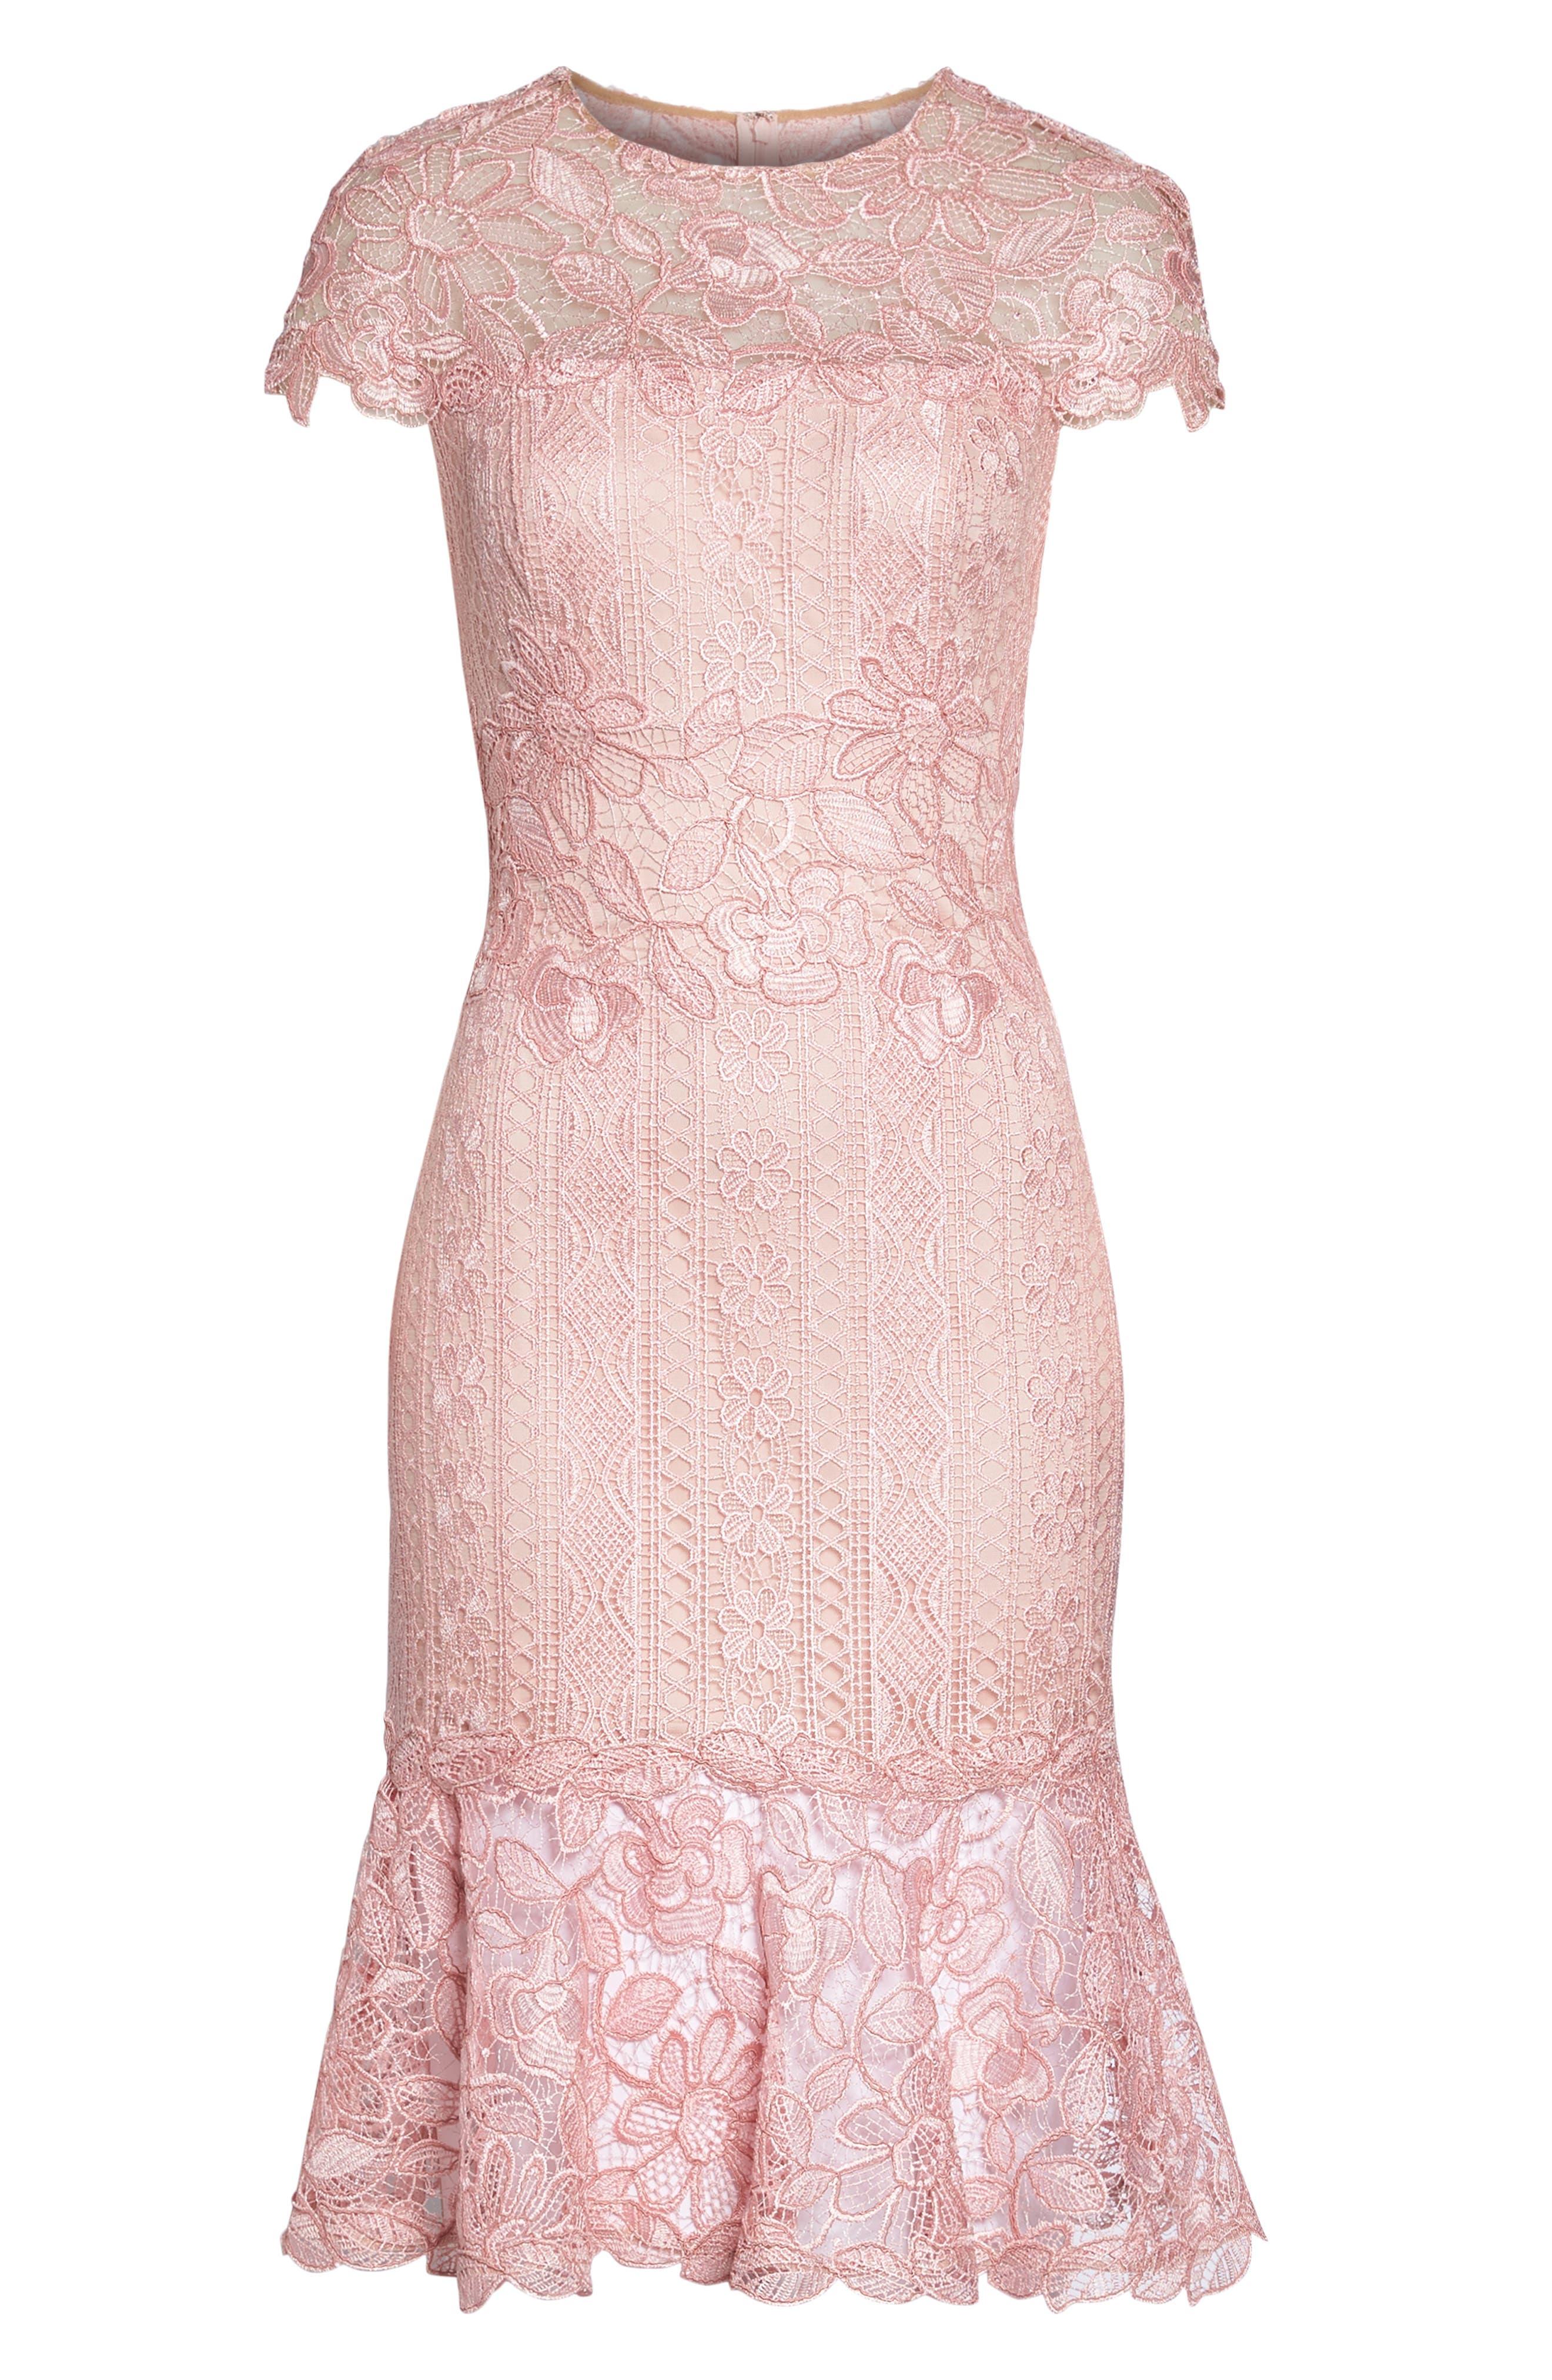 Alice Flounce Hem Lace Dress,                             Alternate thumbnail 6, color,                             680